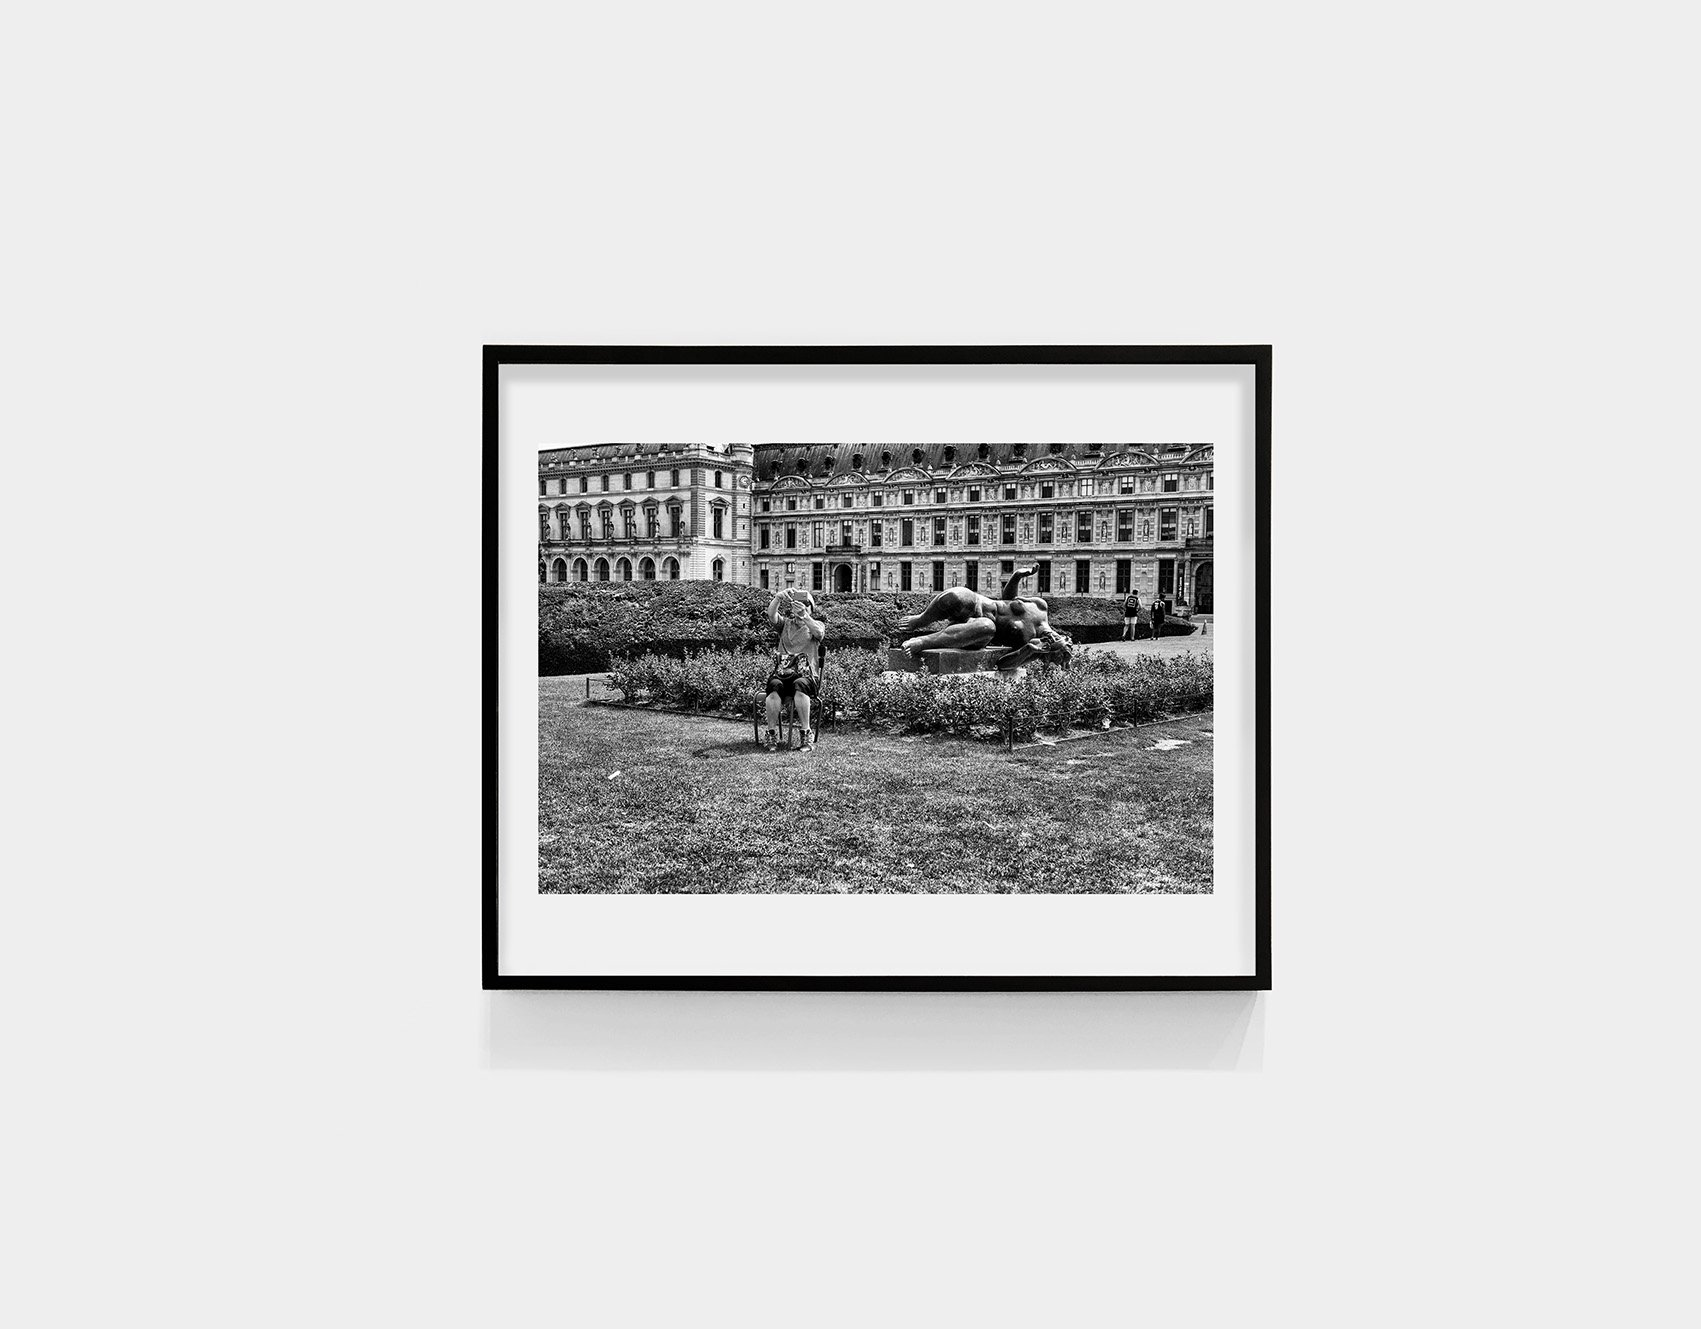 Tirage_Laurent_Delhourme_Jardin_Tuileries